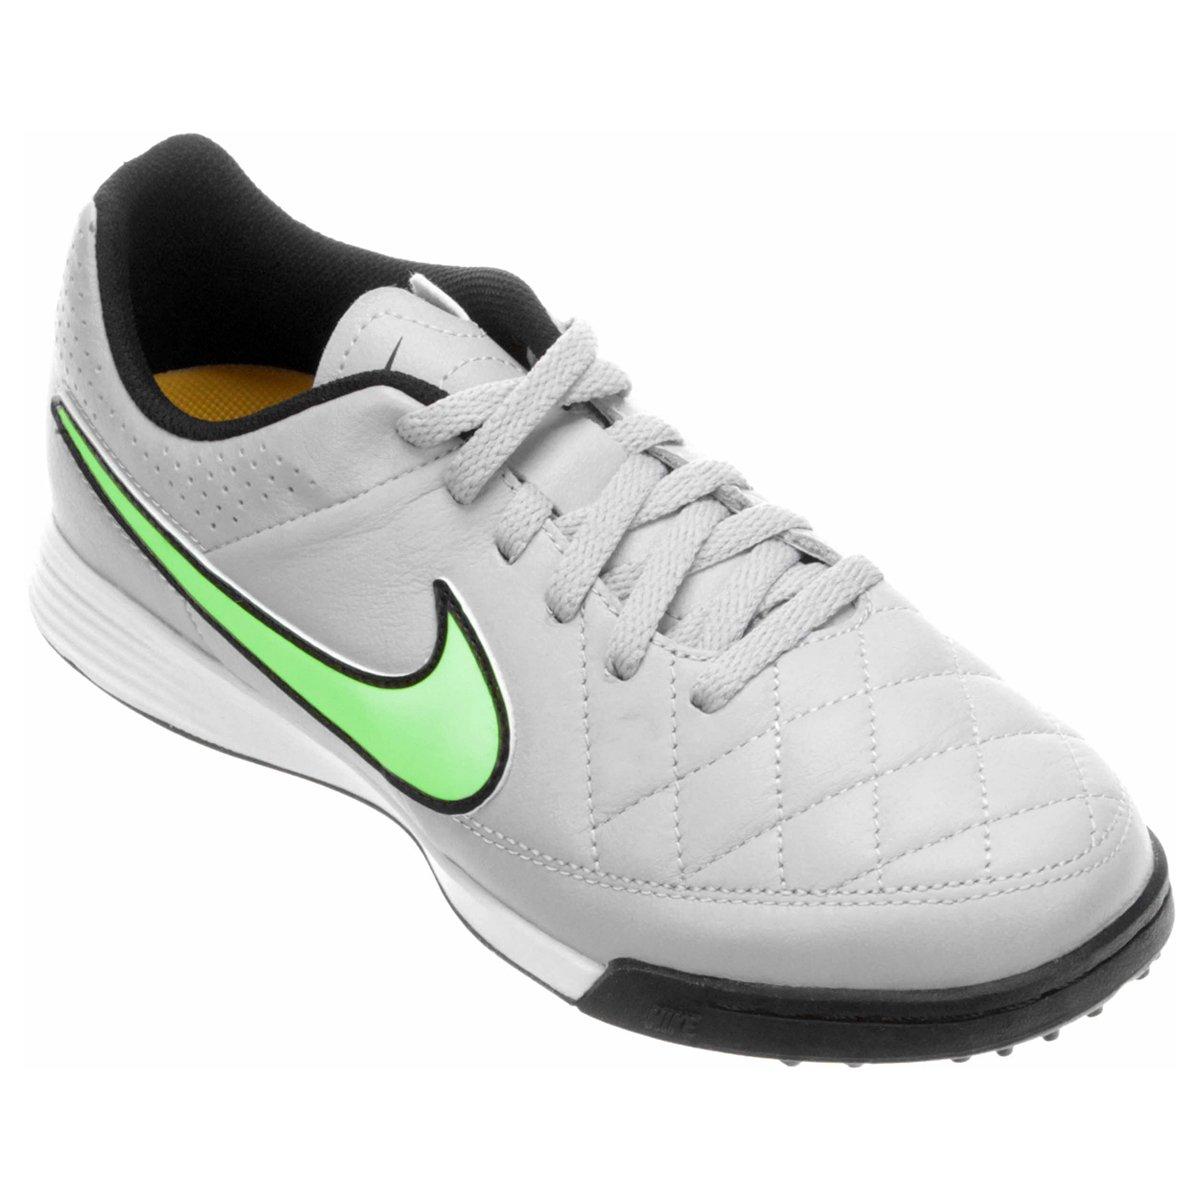 Chuteira Nike Tiempo Gênio Leather TF Society Infantil - Compre Agora  c50cce4d3e5b3